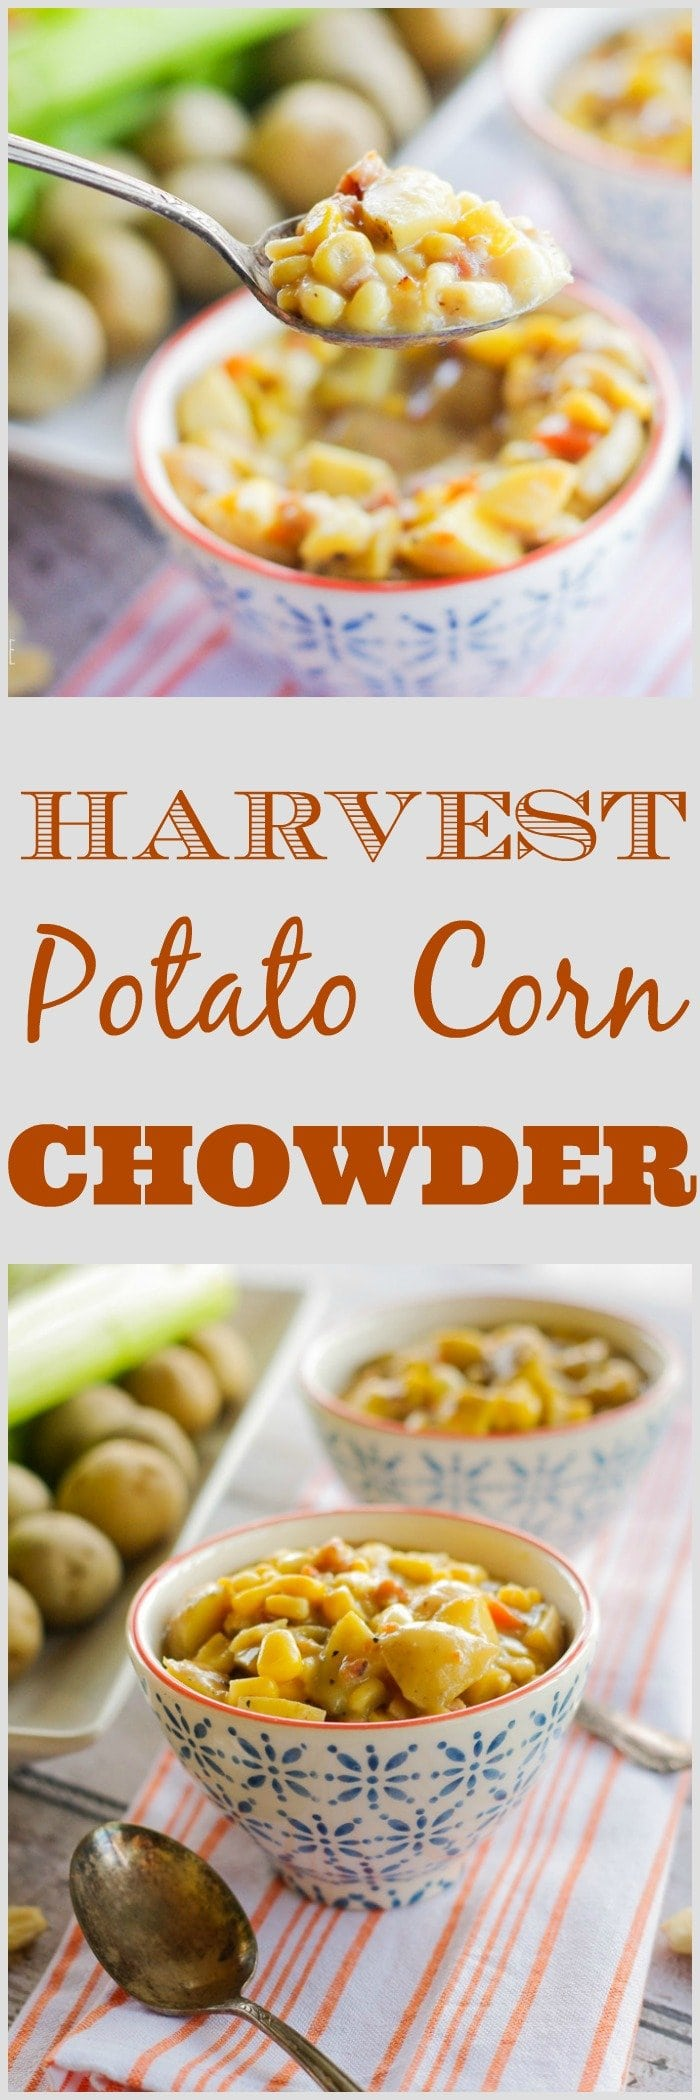 Harvest Potato Corn Chowder   www.homeandplate.com   Tender chunks of potato, crispy bits of pancetta, summer sweet crisp corn make up this hearty soup.